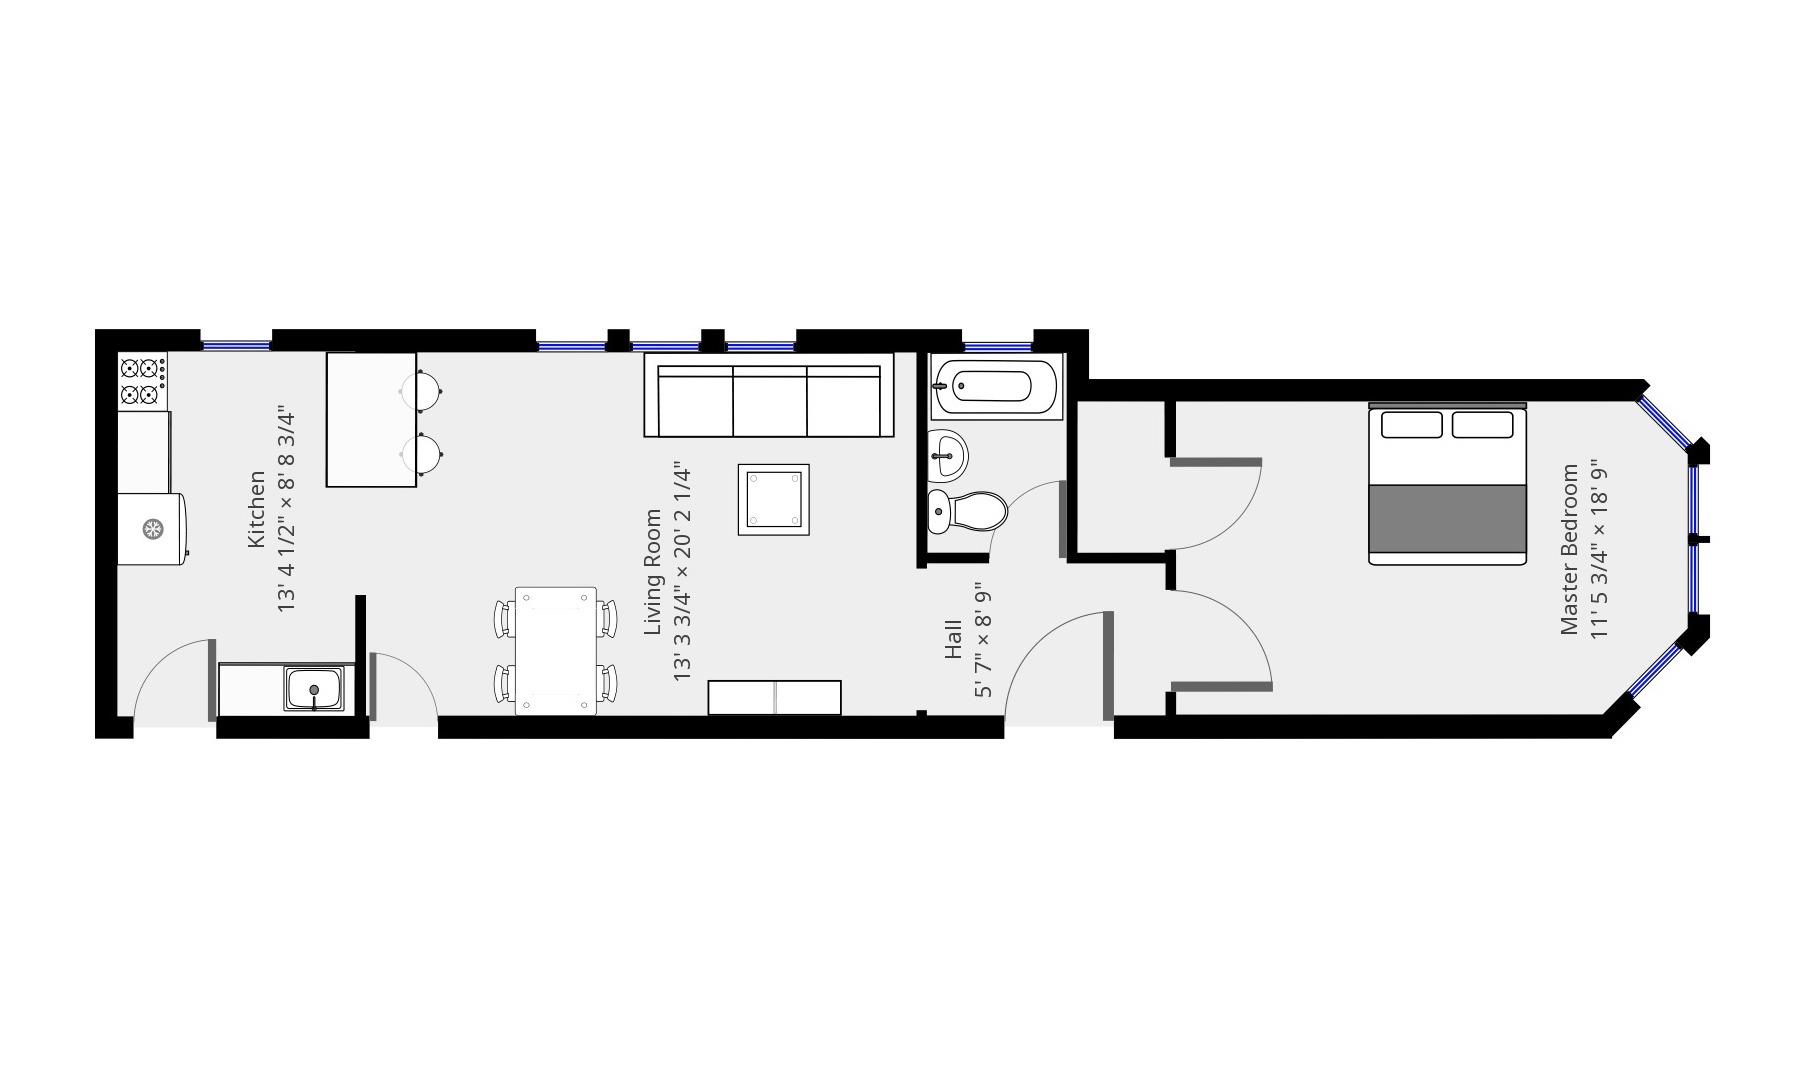 790sf 1BR floor plan